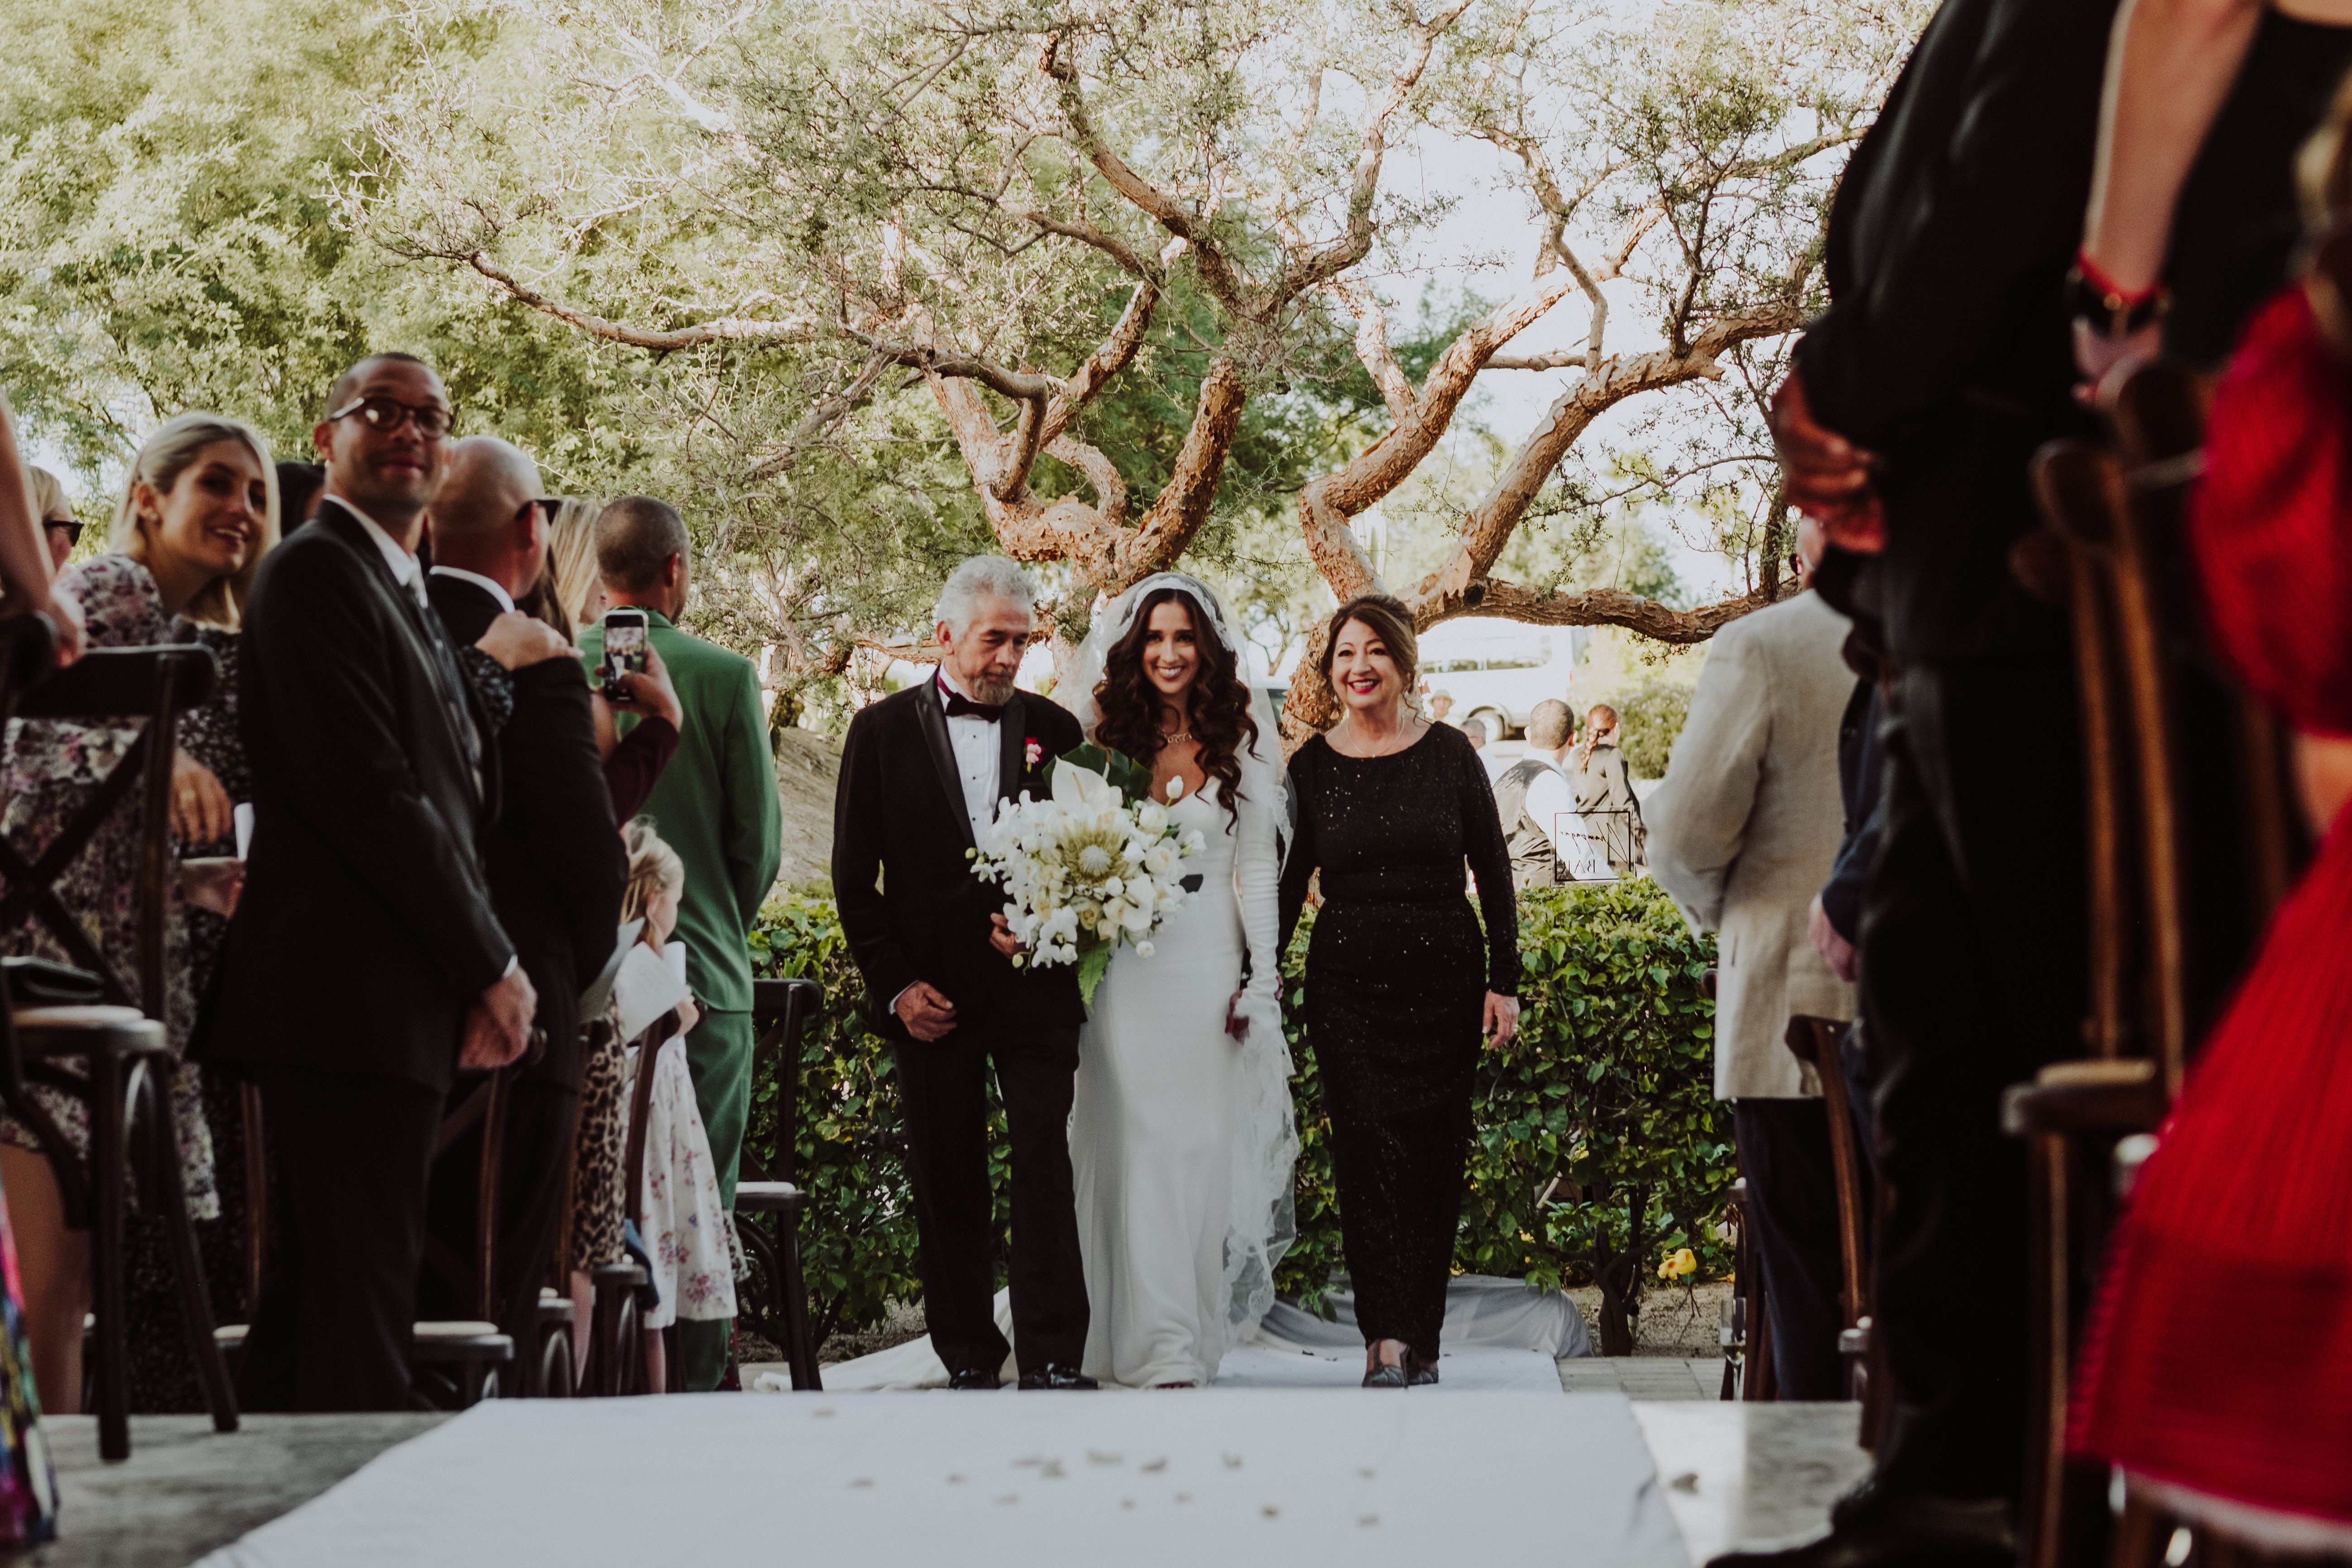 Godparents walking bride down the aisle